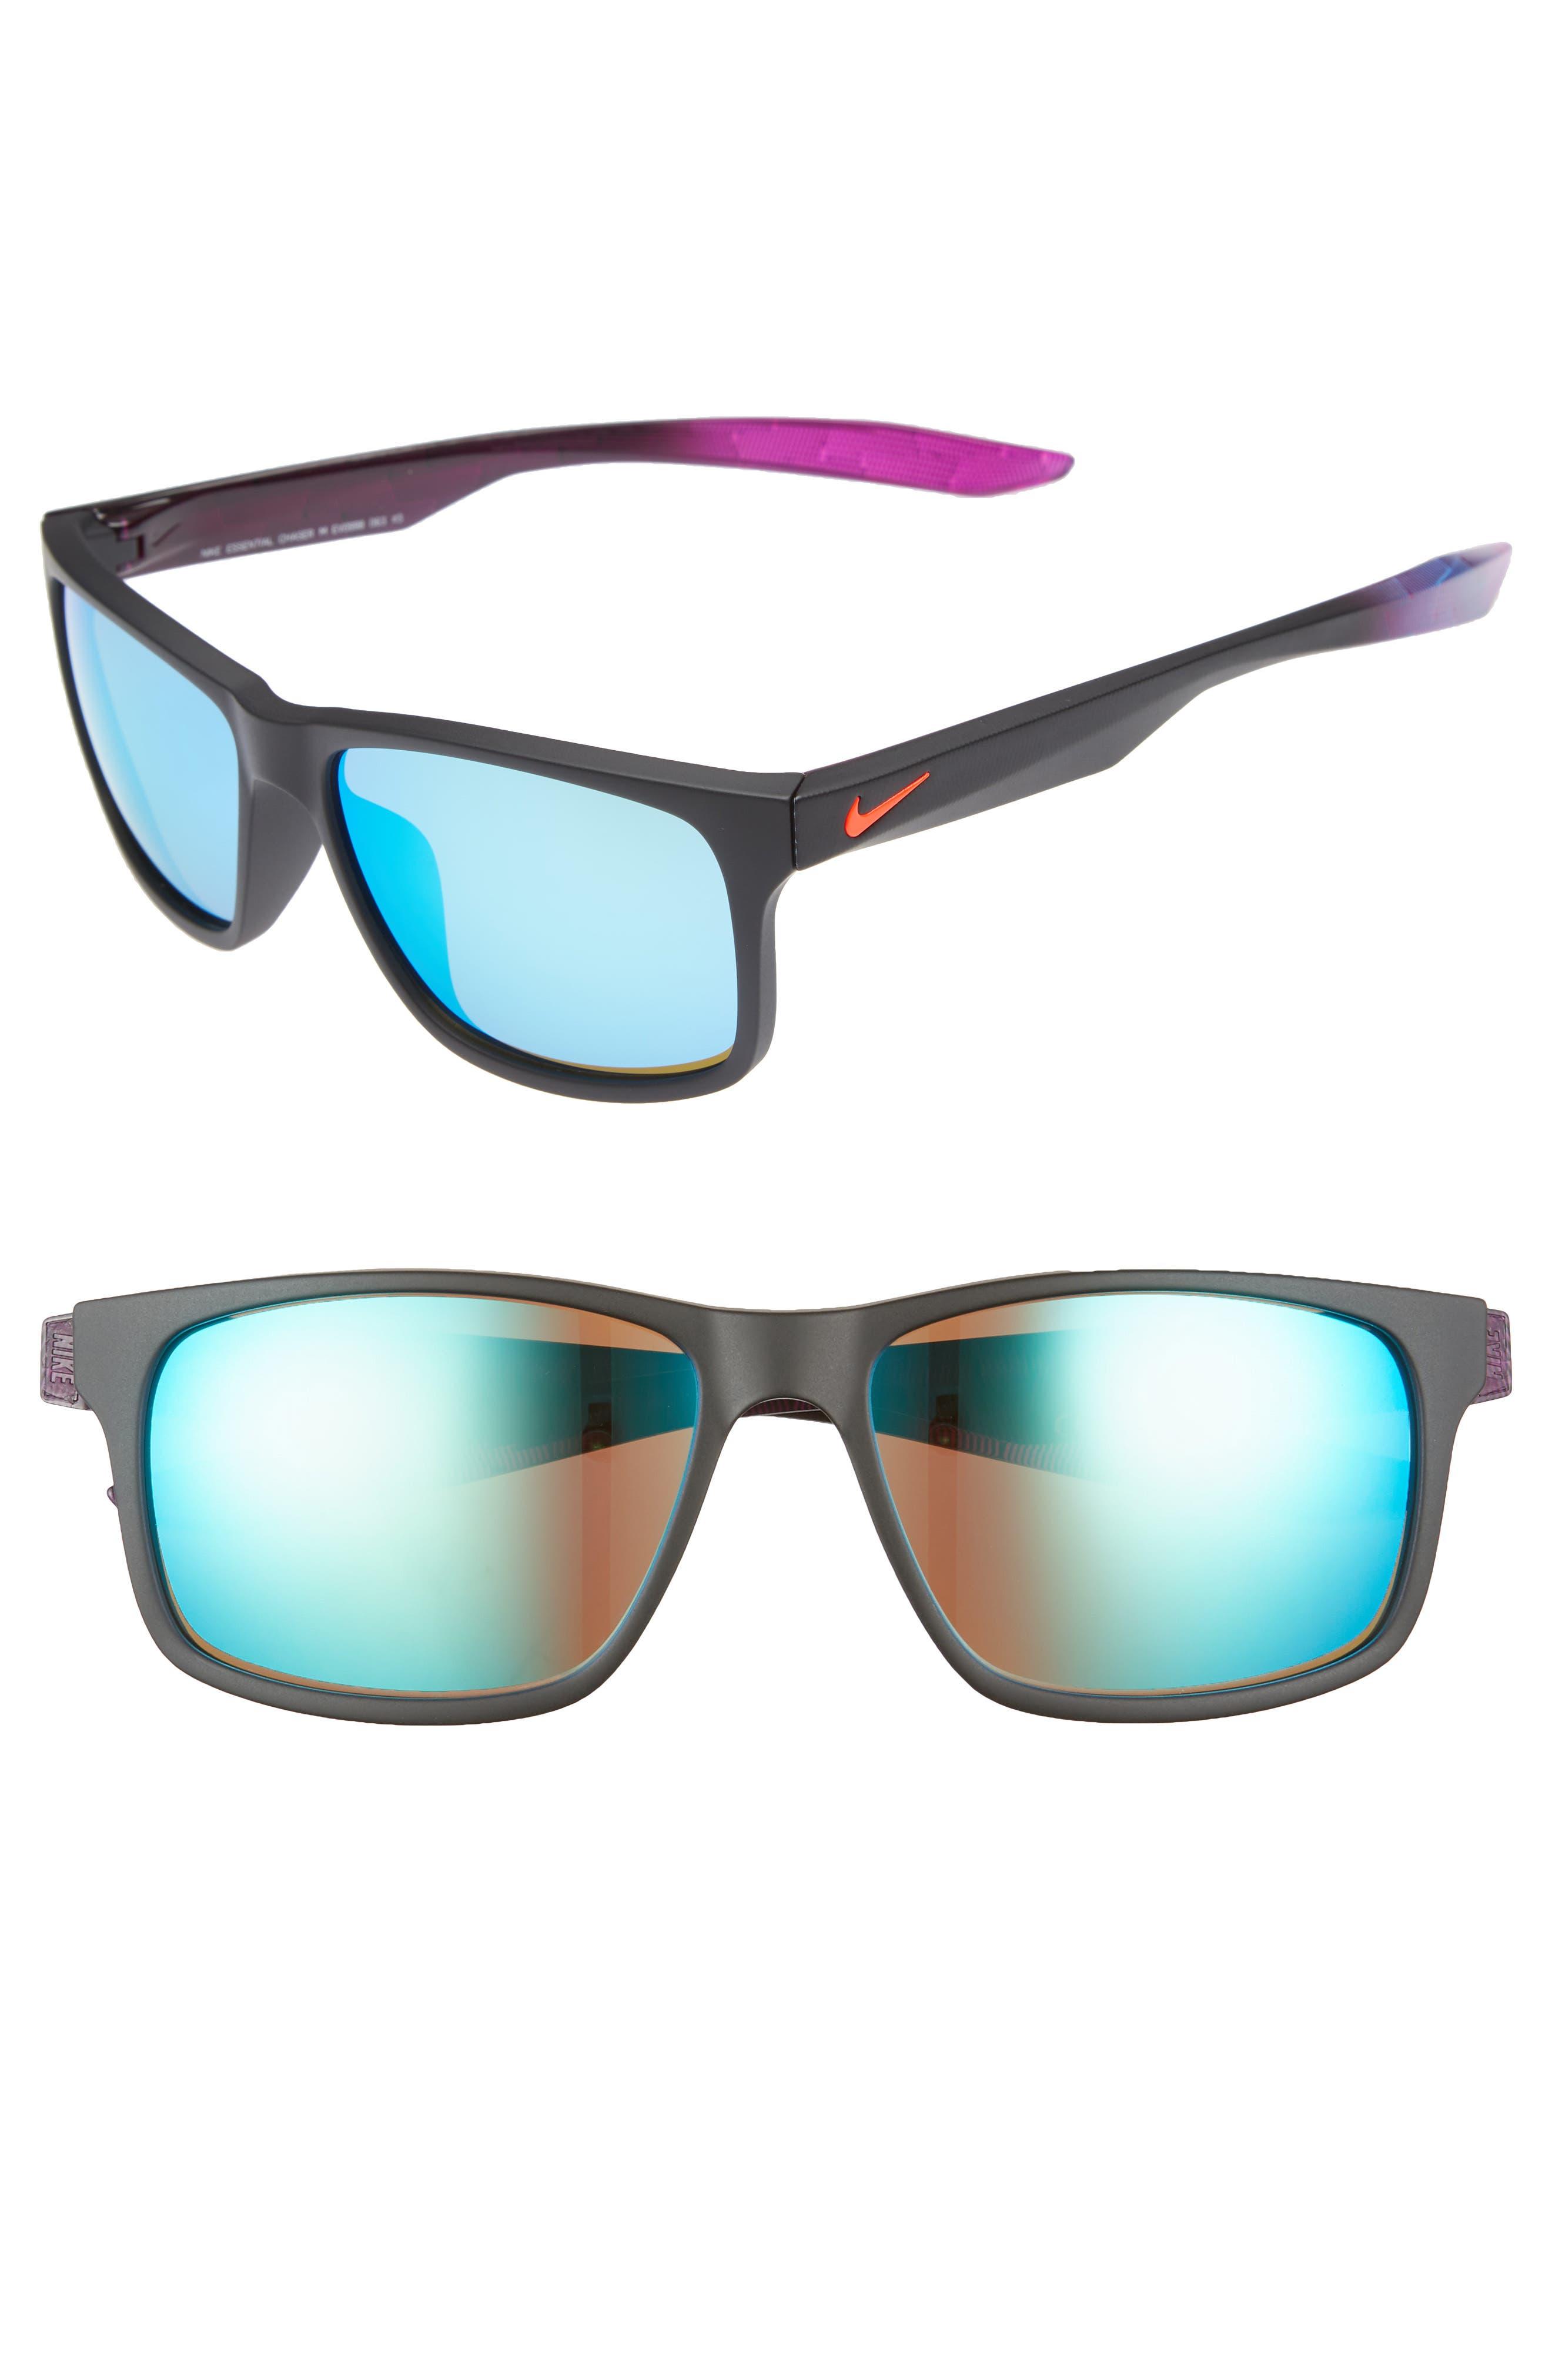 Nike Essential Chaser 57Mm Reflective Sunglasses - Matte Black/ Green